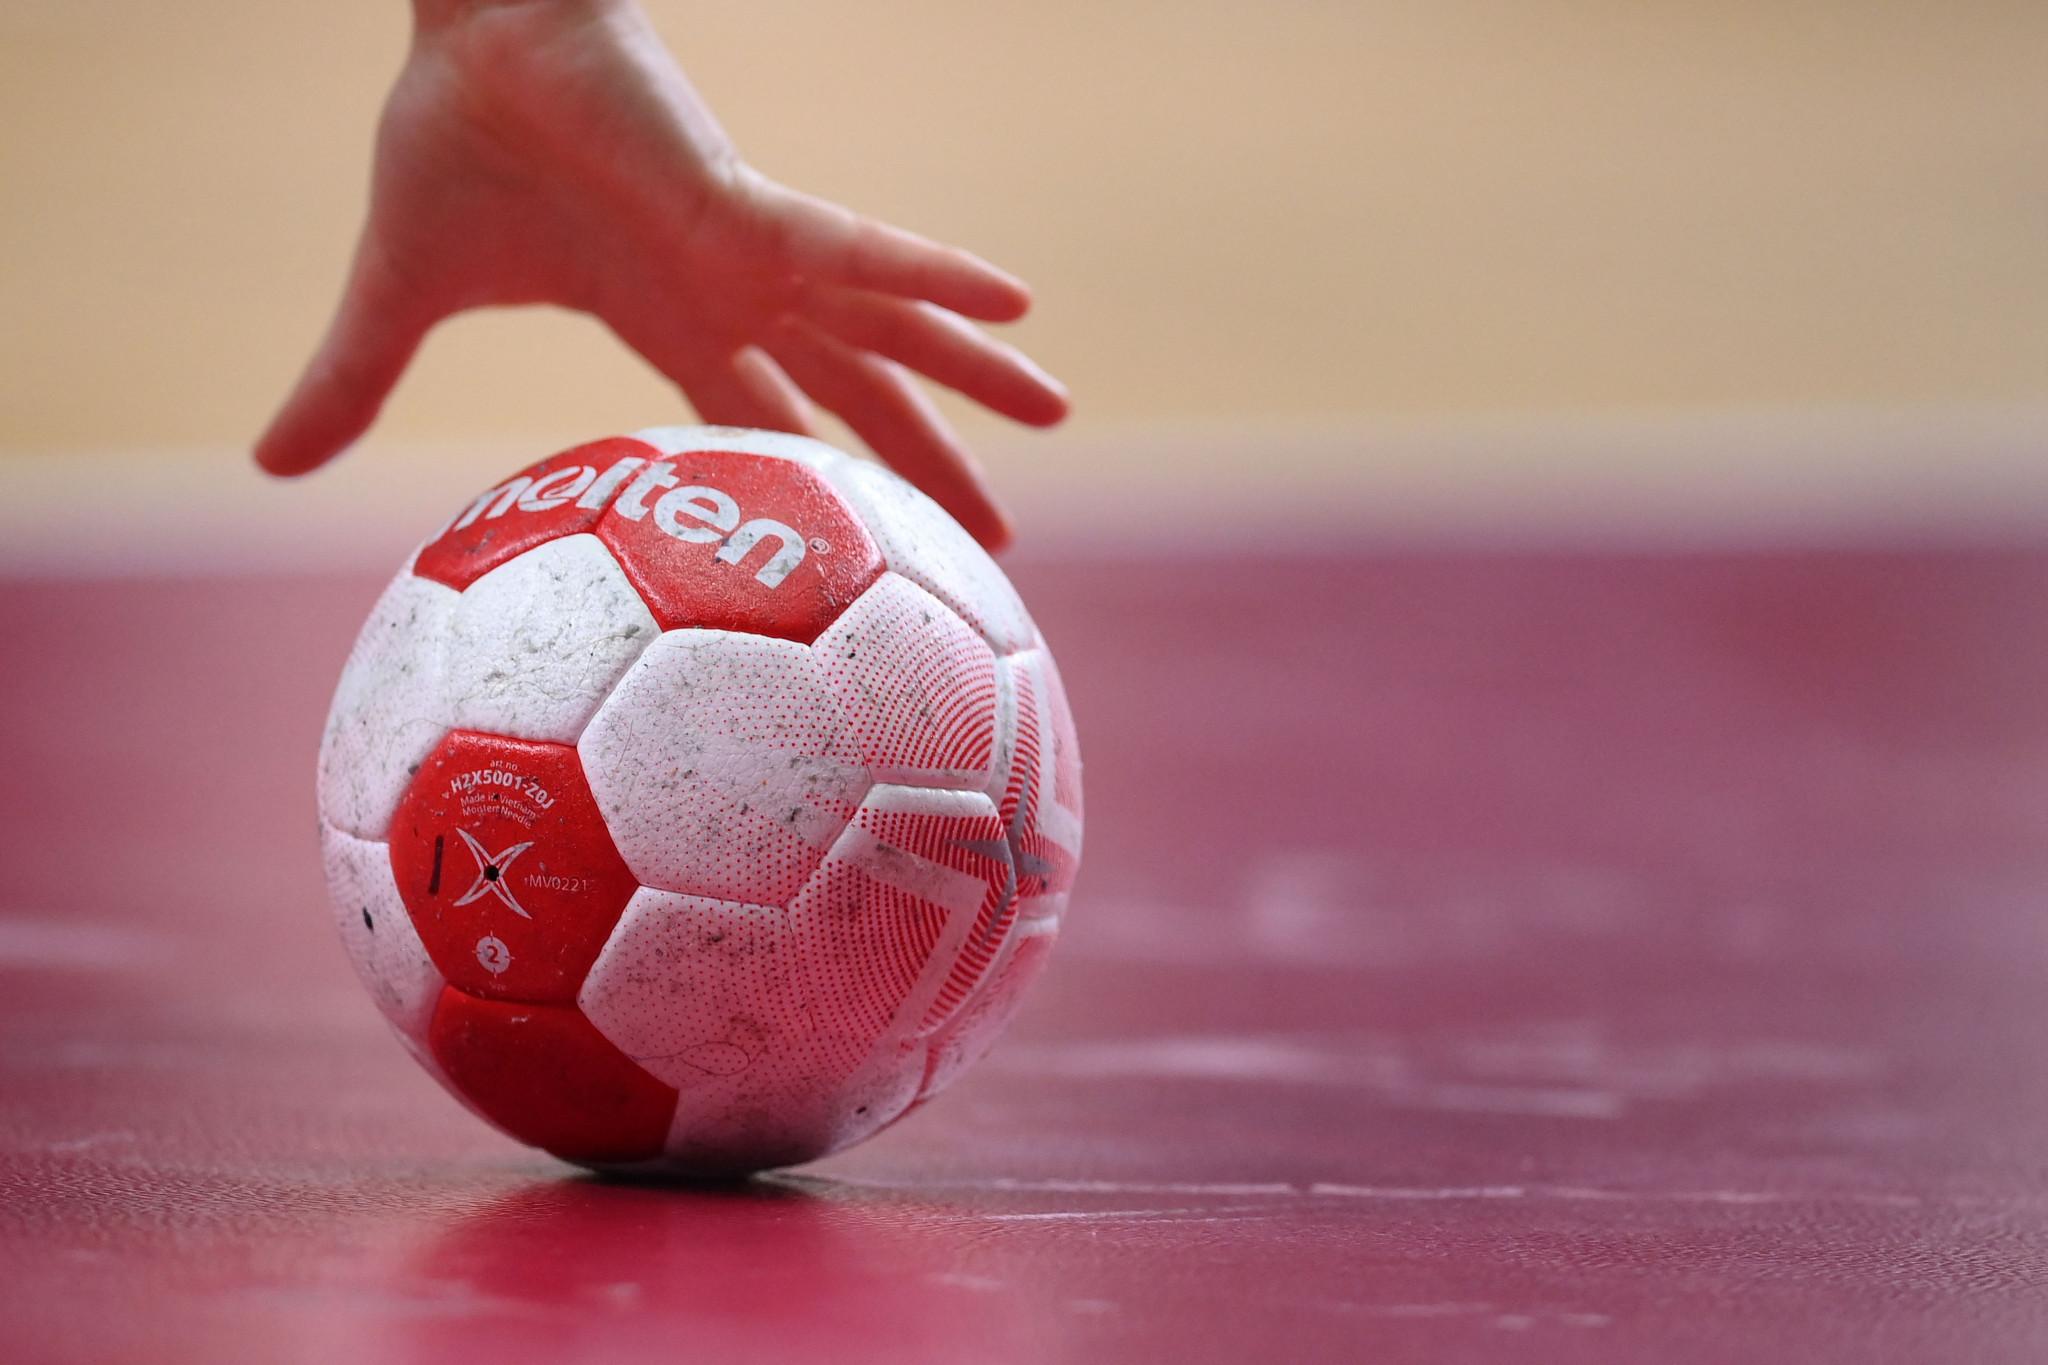 Puerto Rico and Greenland reach North American and Caribbean Women's Handball Championship final